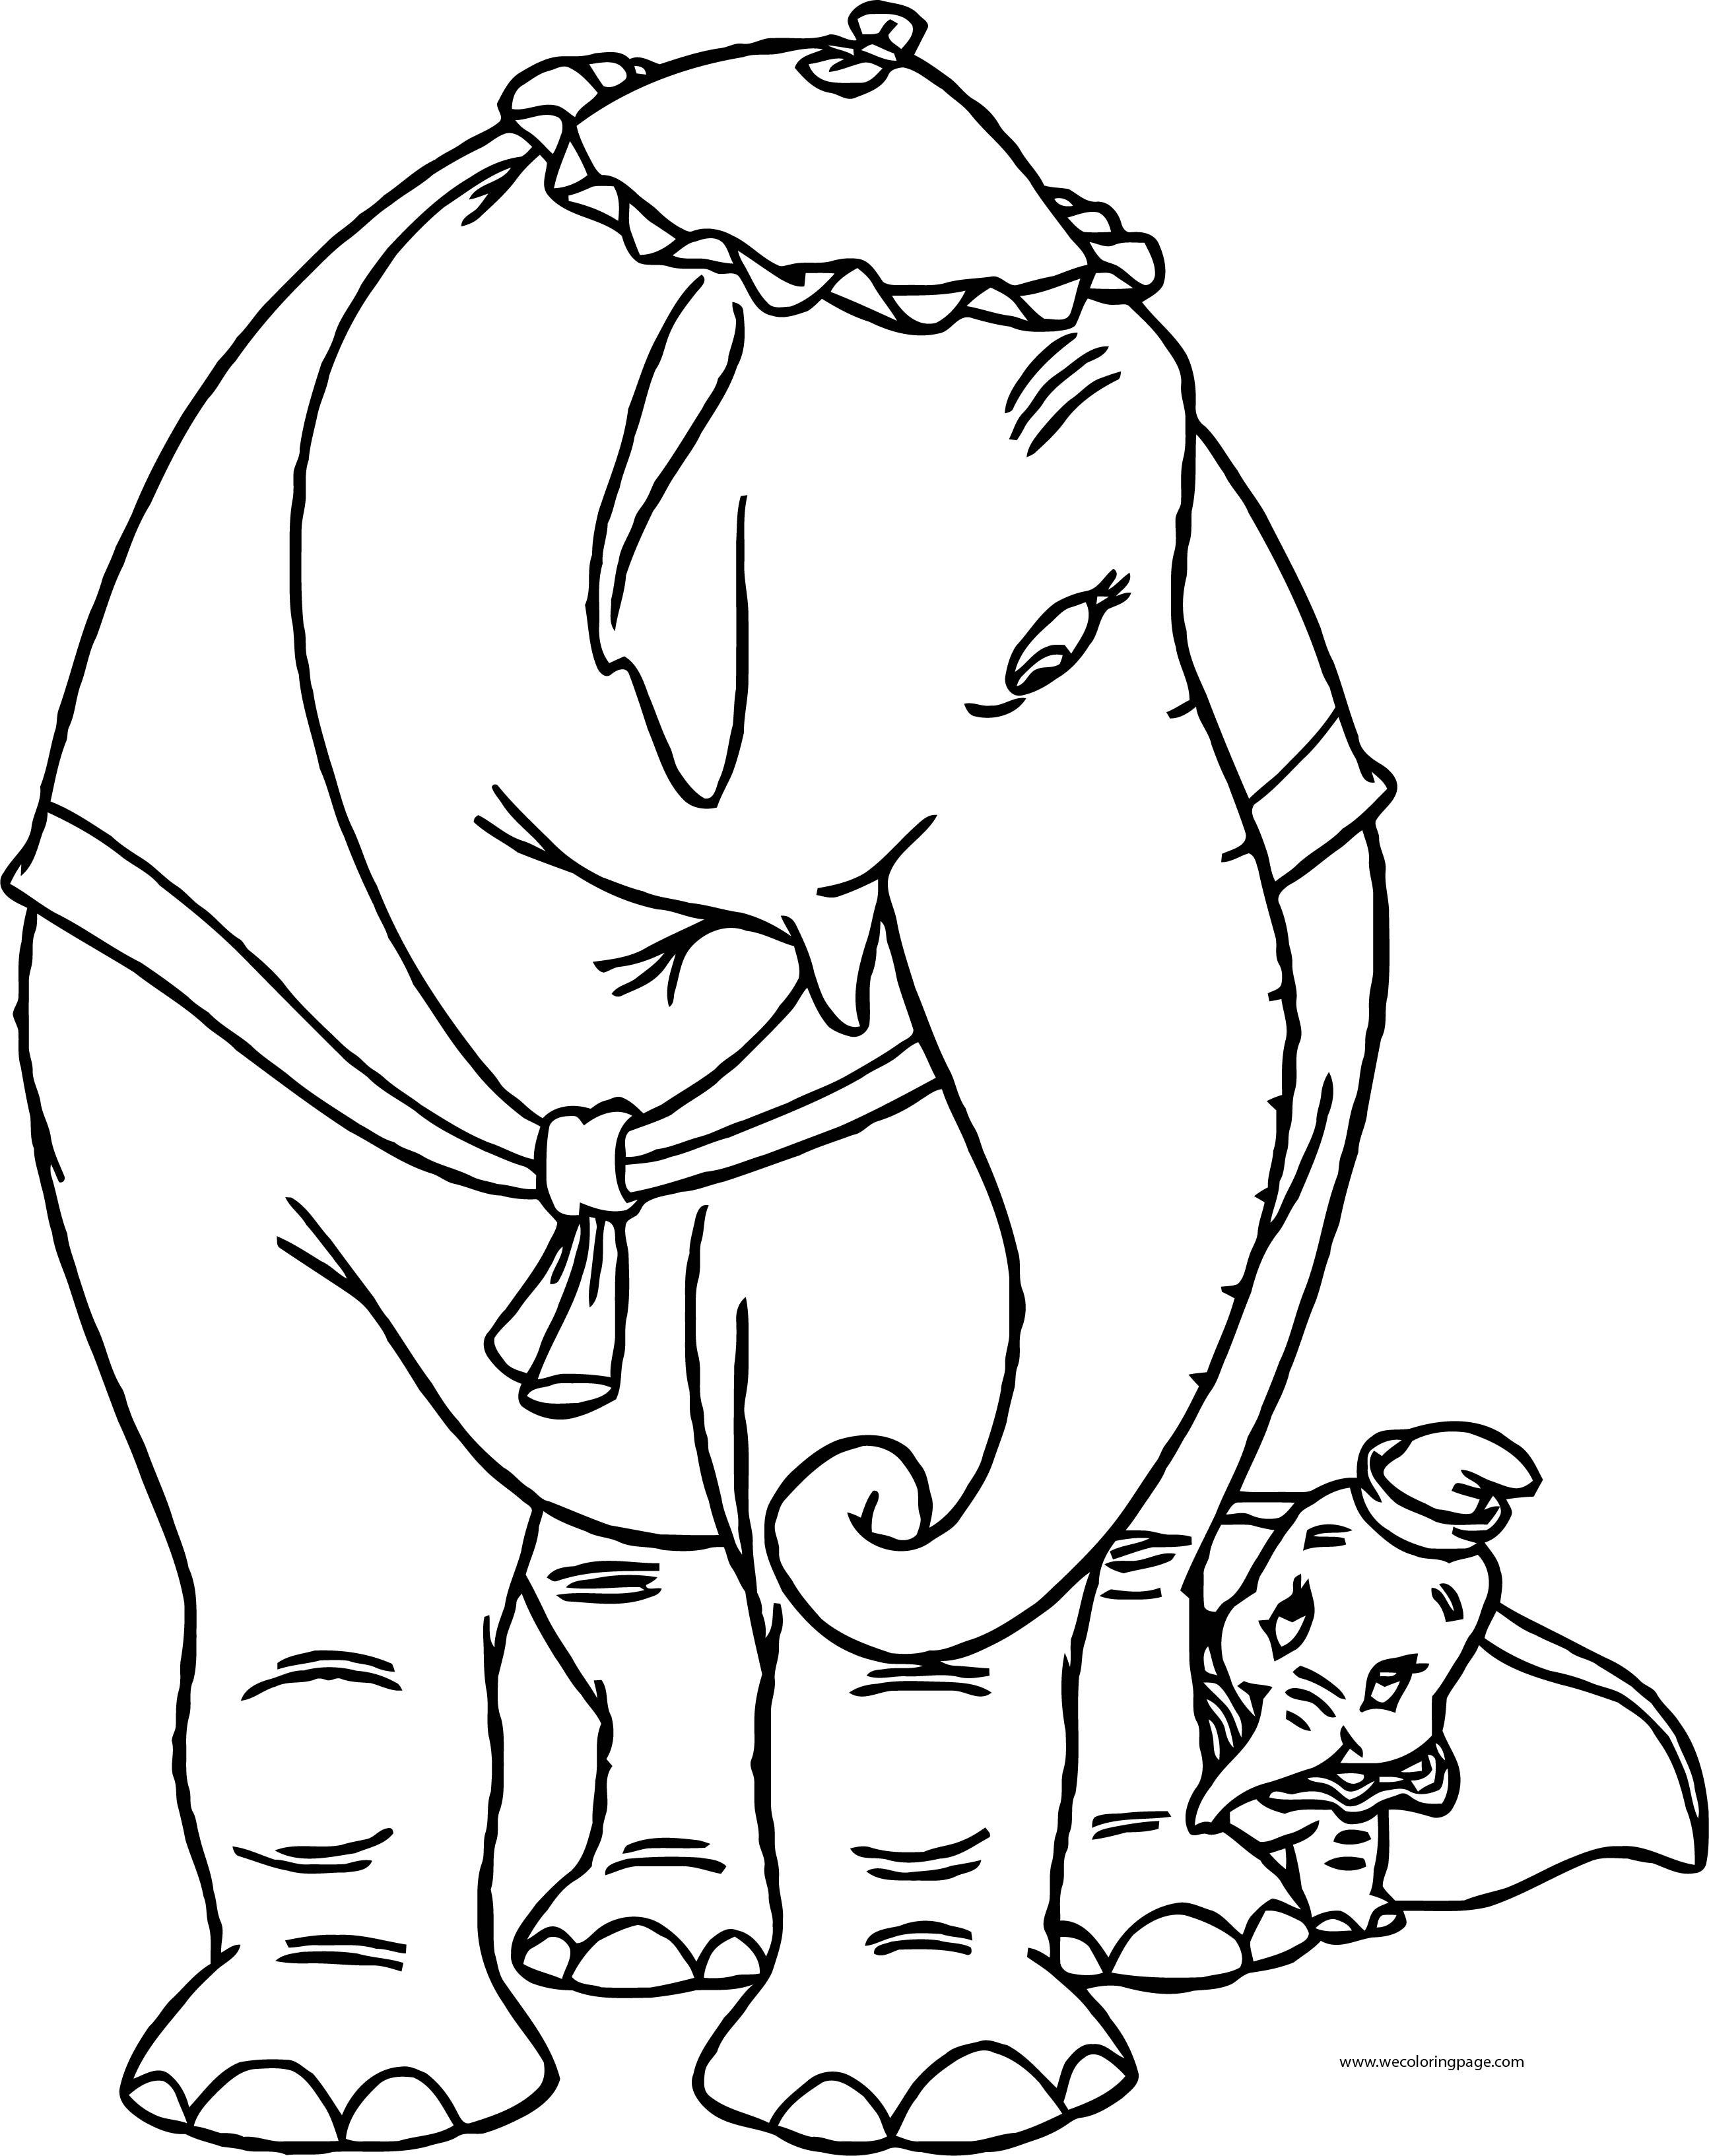 jumbo coloring pages - jumbo 1 coloring pages